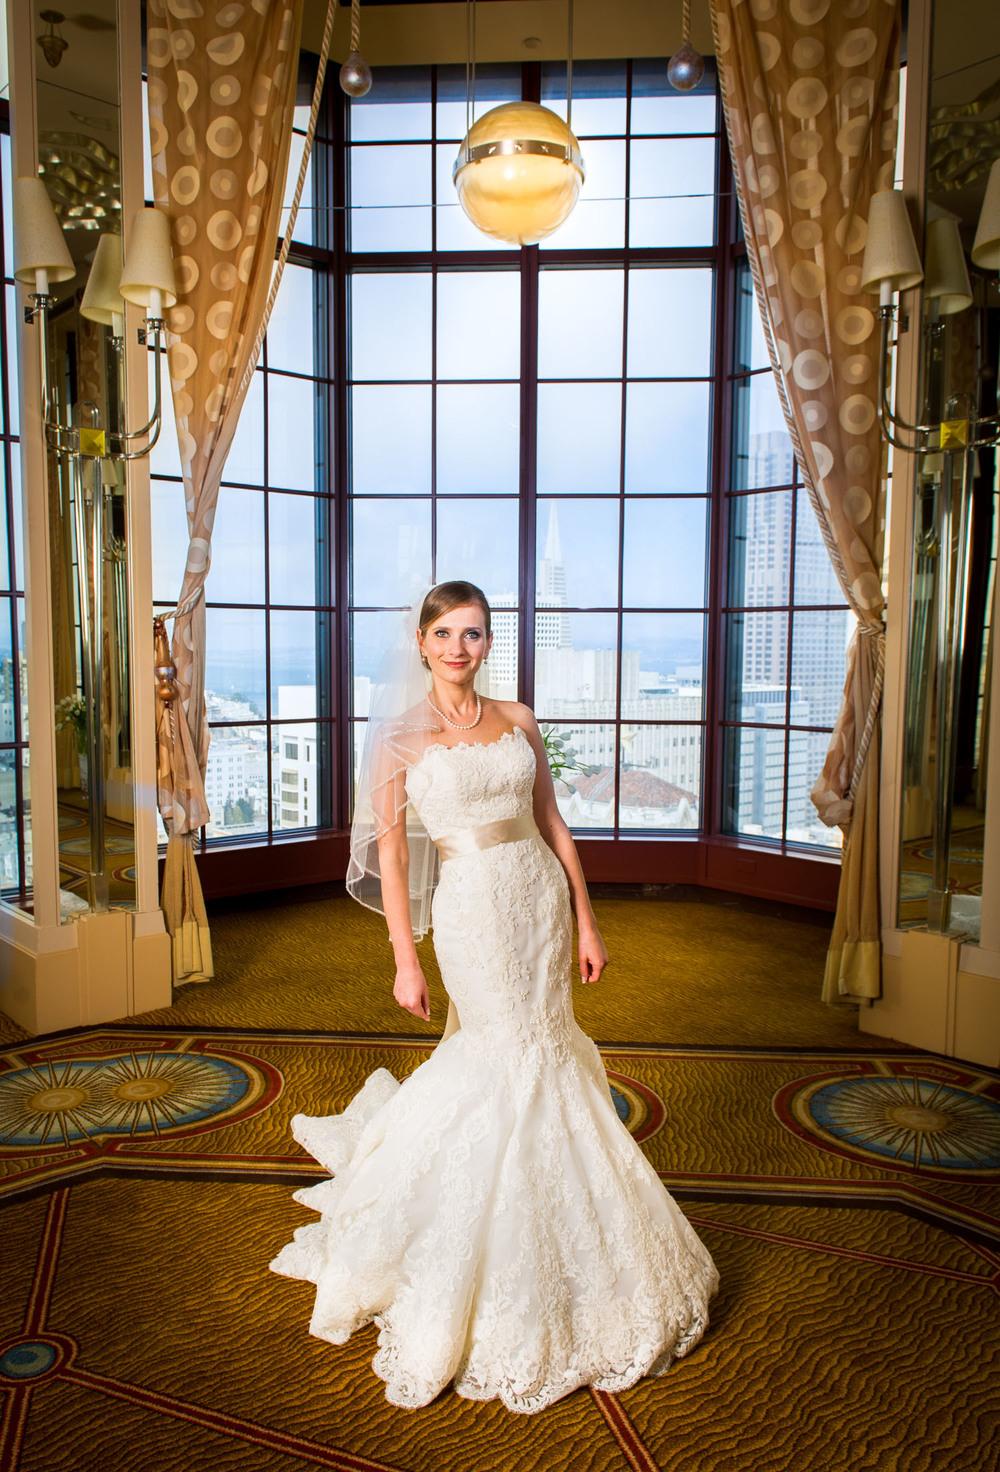 stewart_bertrand_wedding_photography_sp-1026.jpg